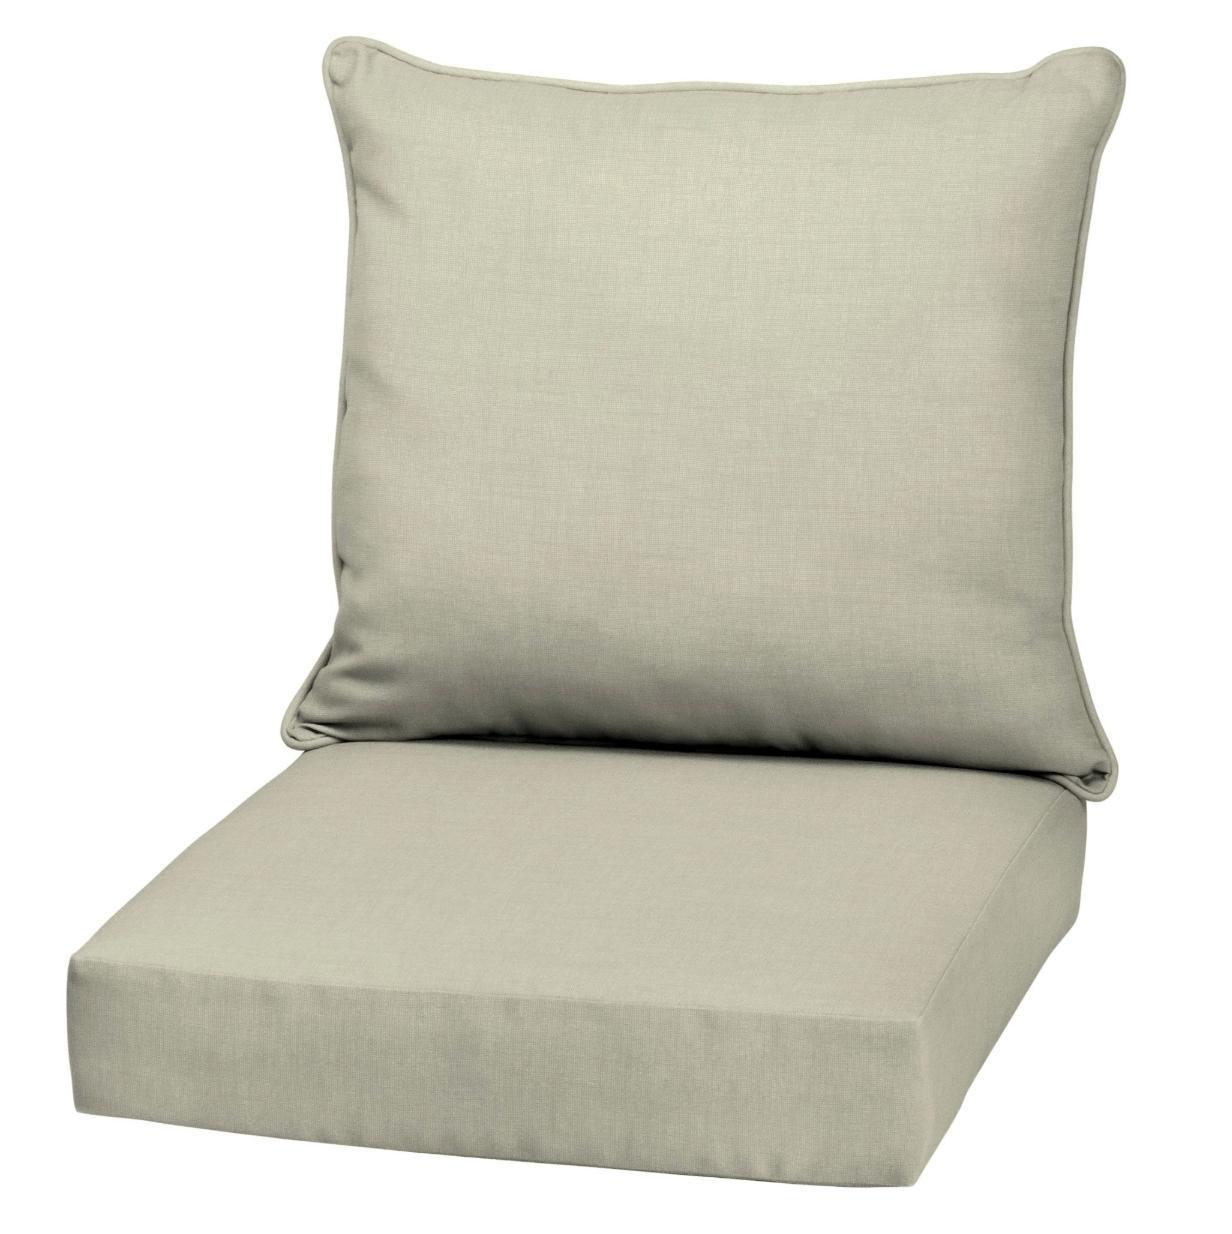 outdoor deep seat chair patio cushions beige